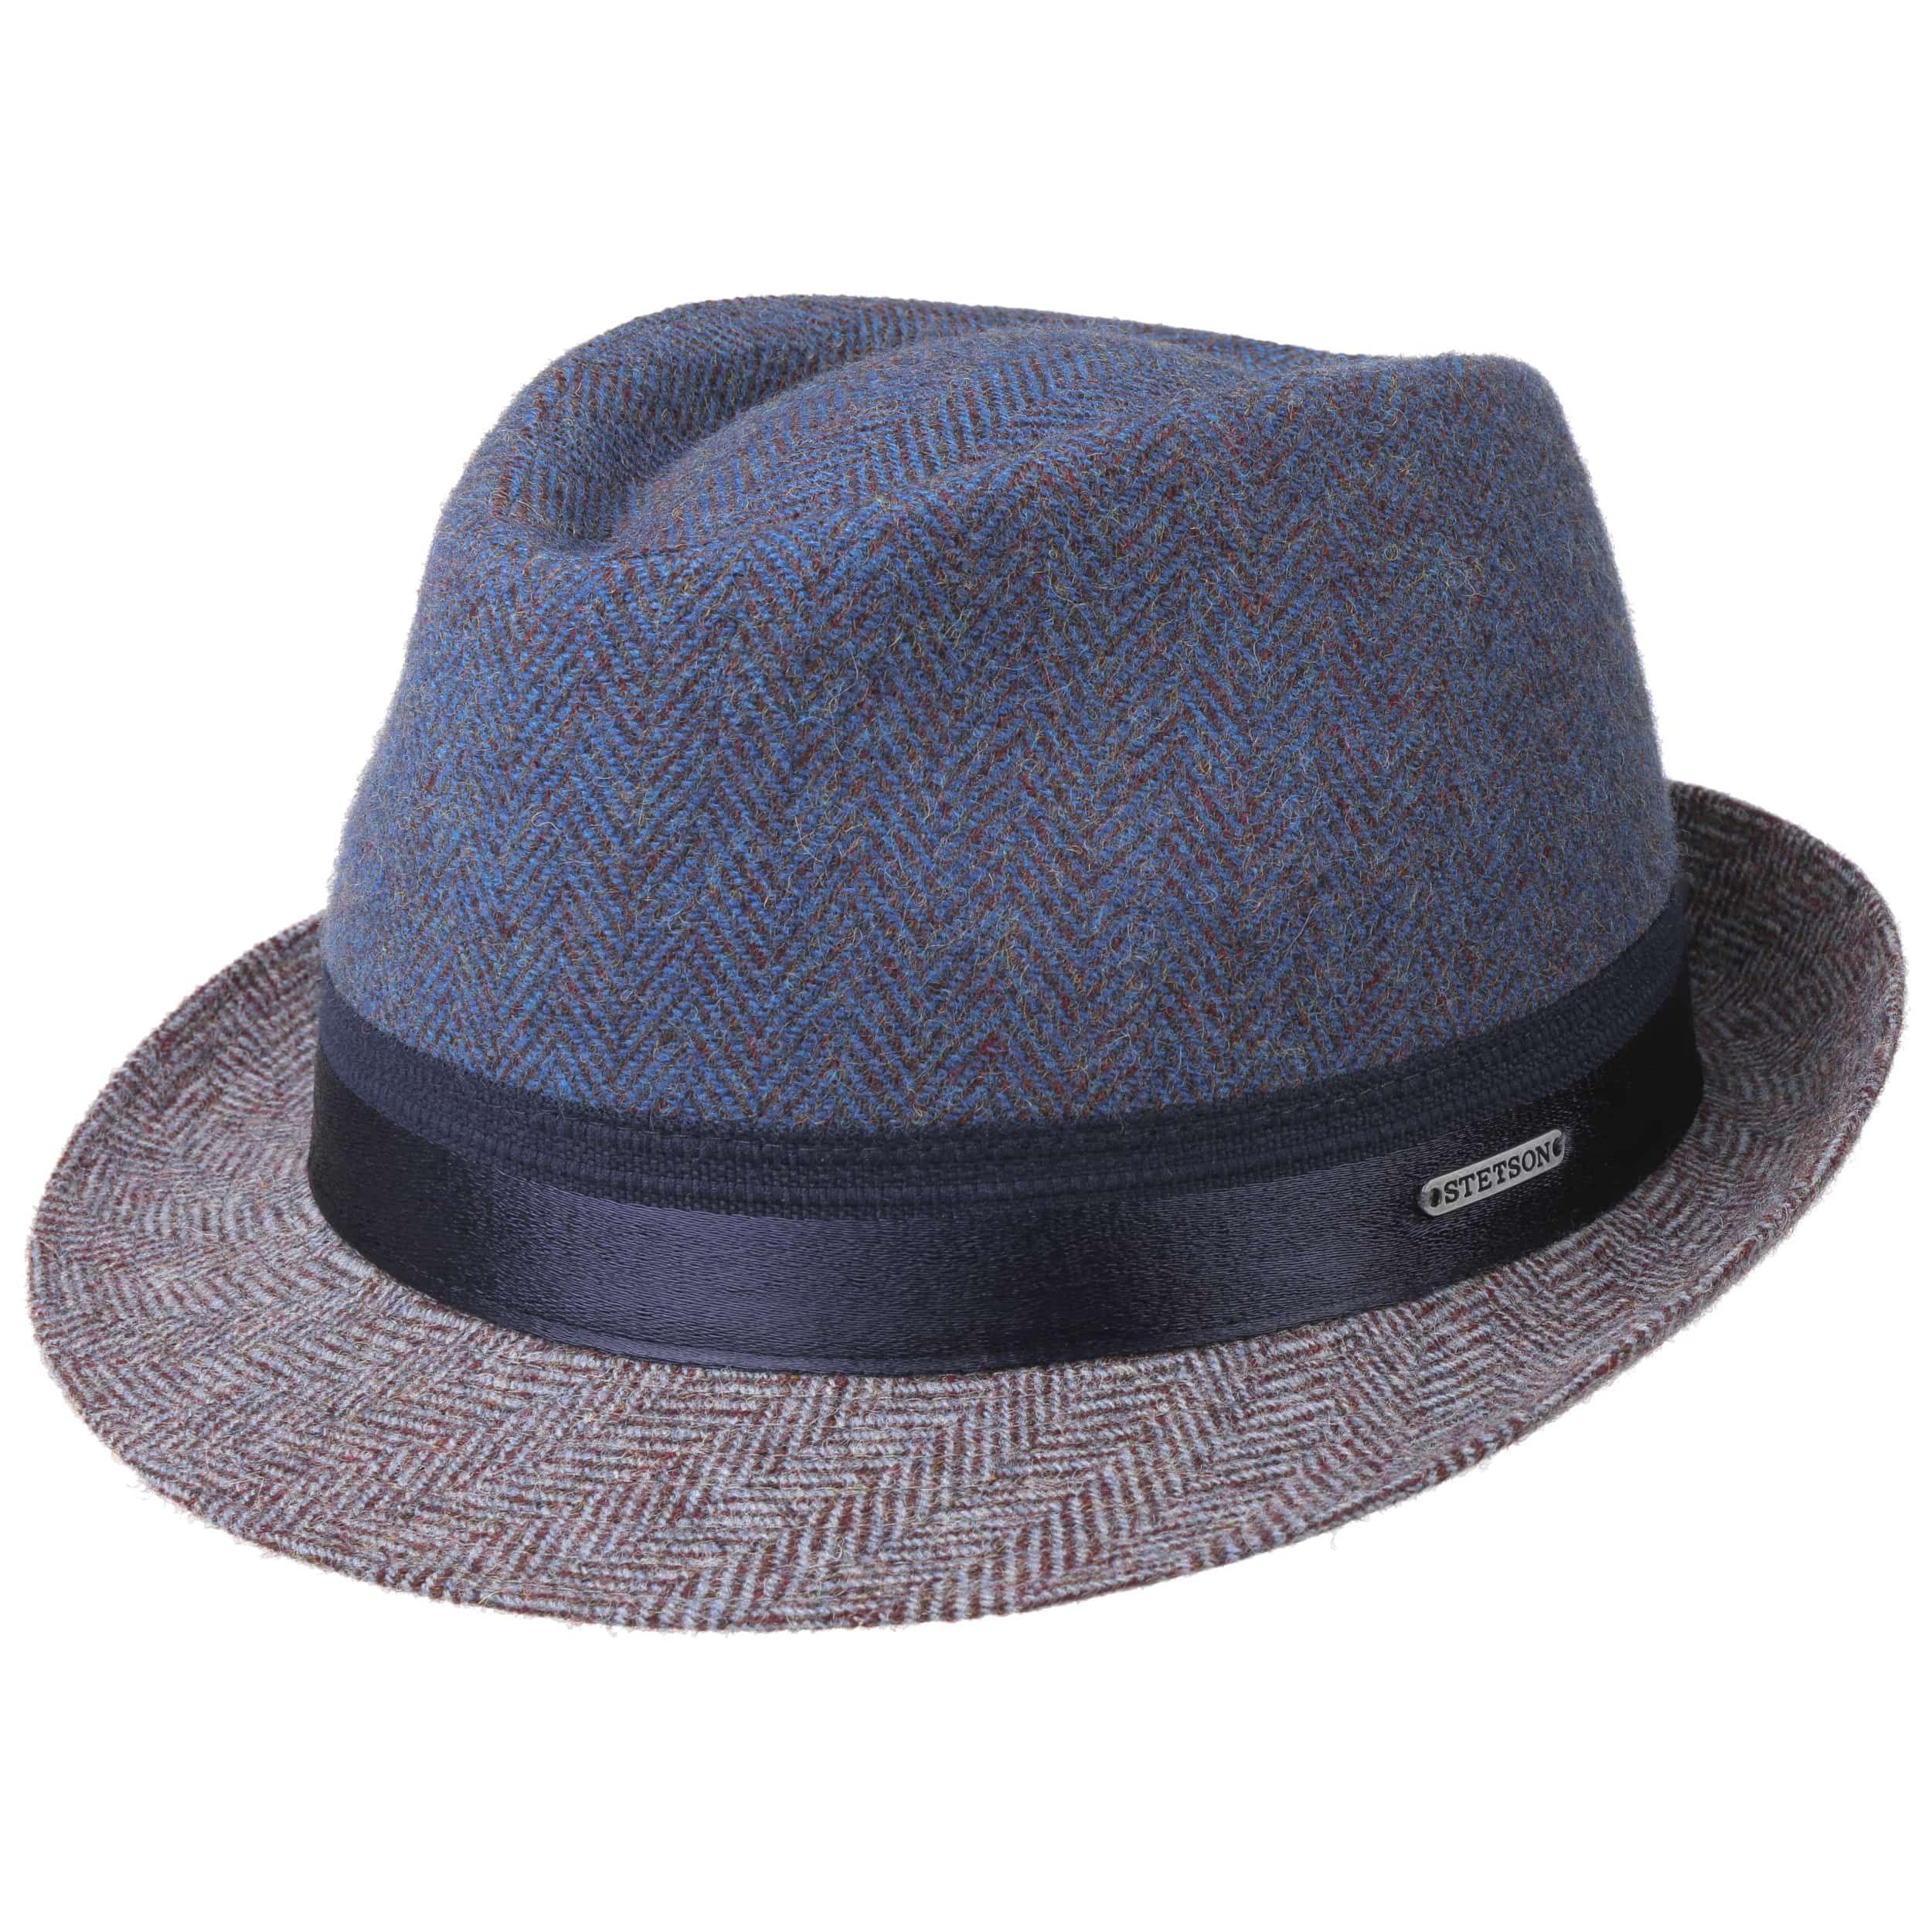 Sombrero de Lana Herringbone Trilby azul-burdeos